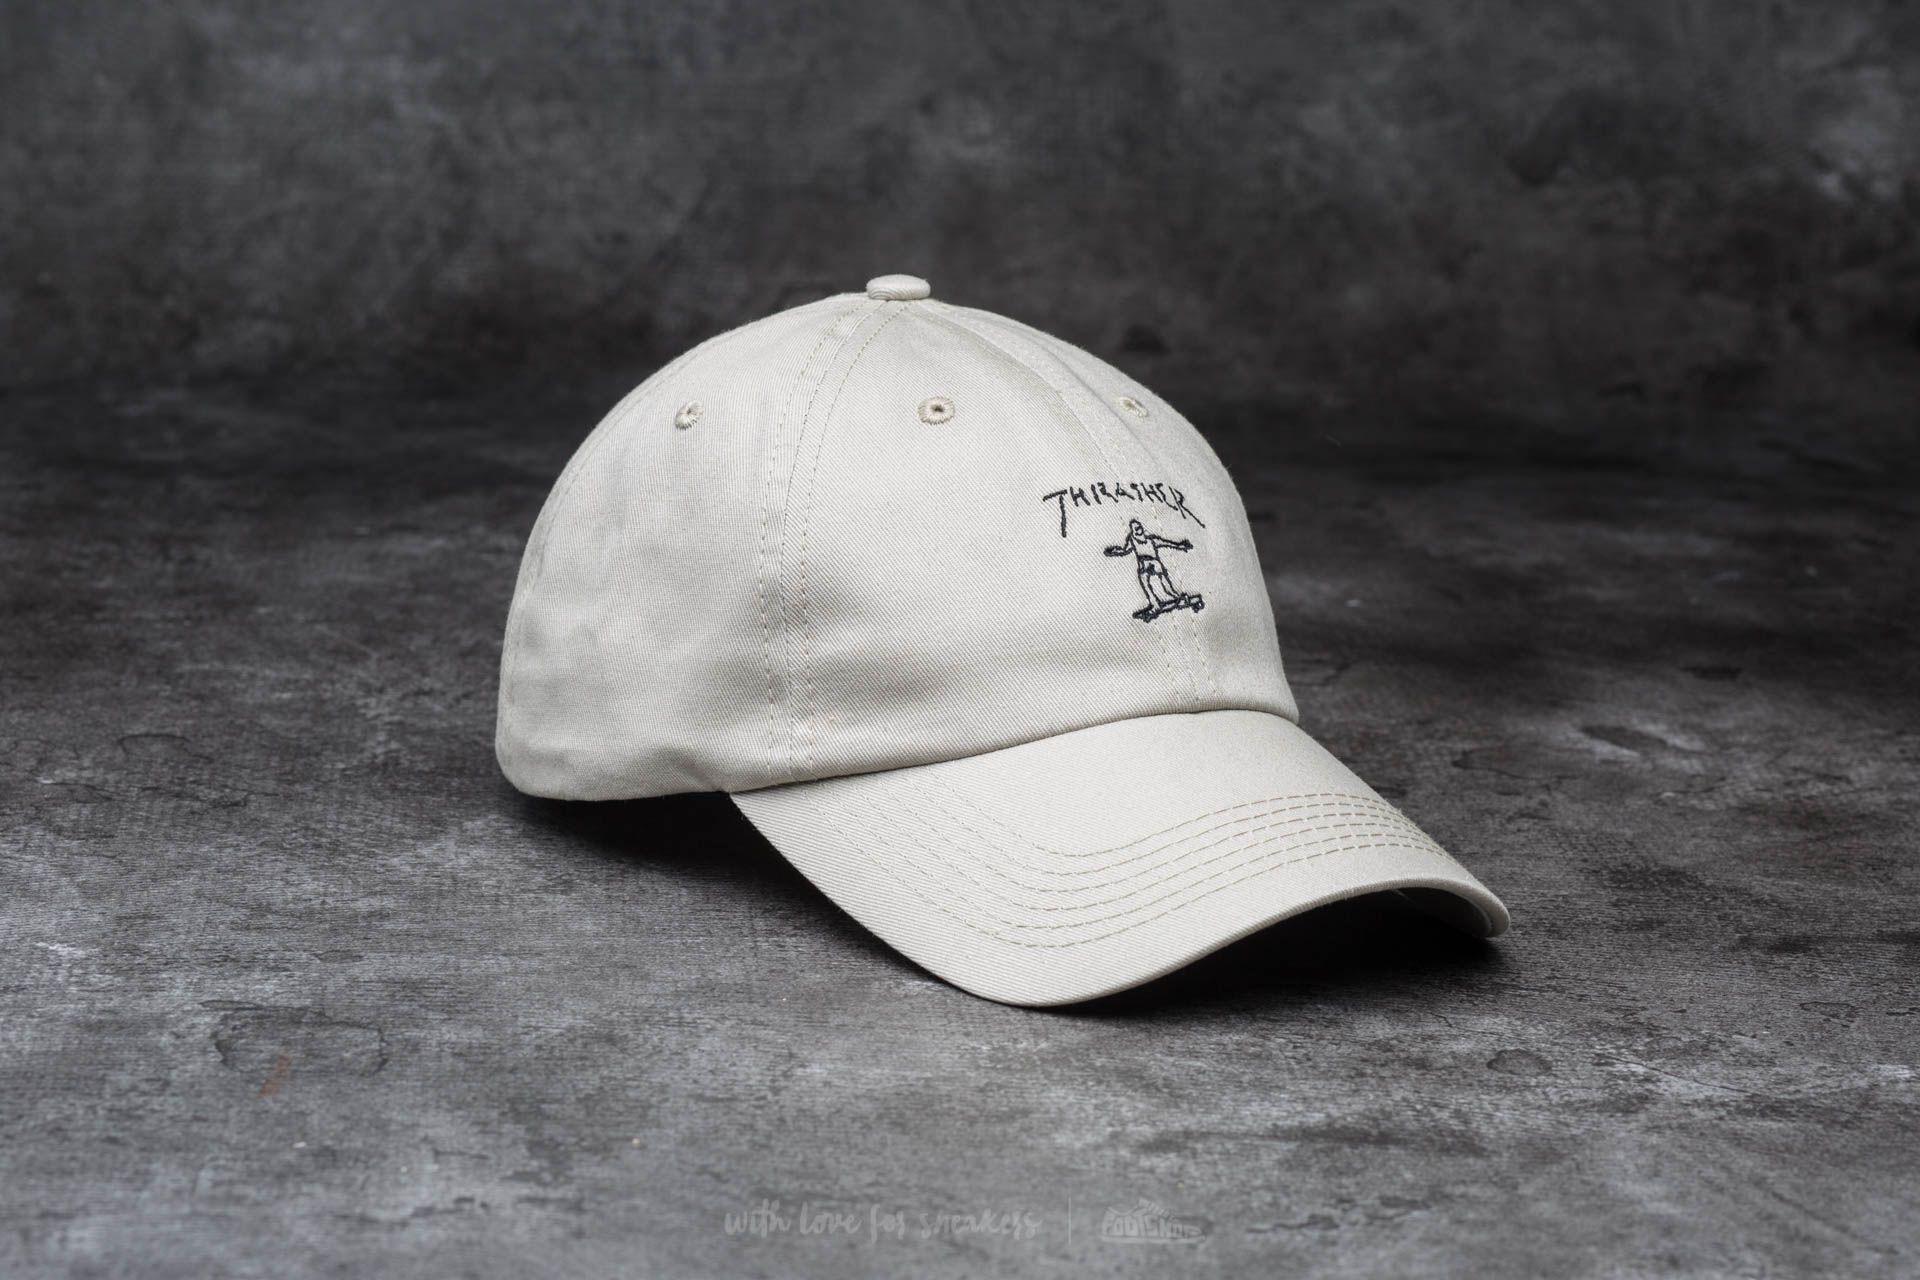 d86c2b9e49222 Thrasher Gonz Old Timer Hat Tan  Black